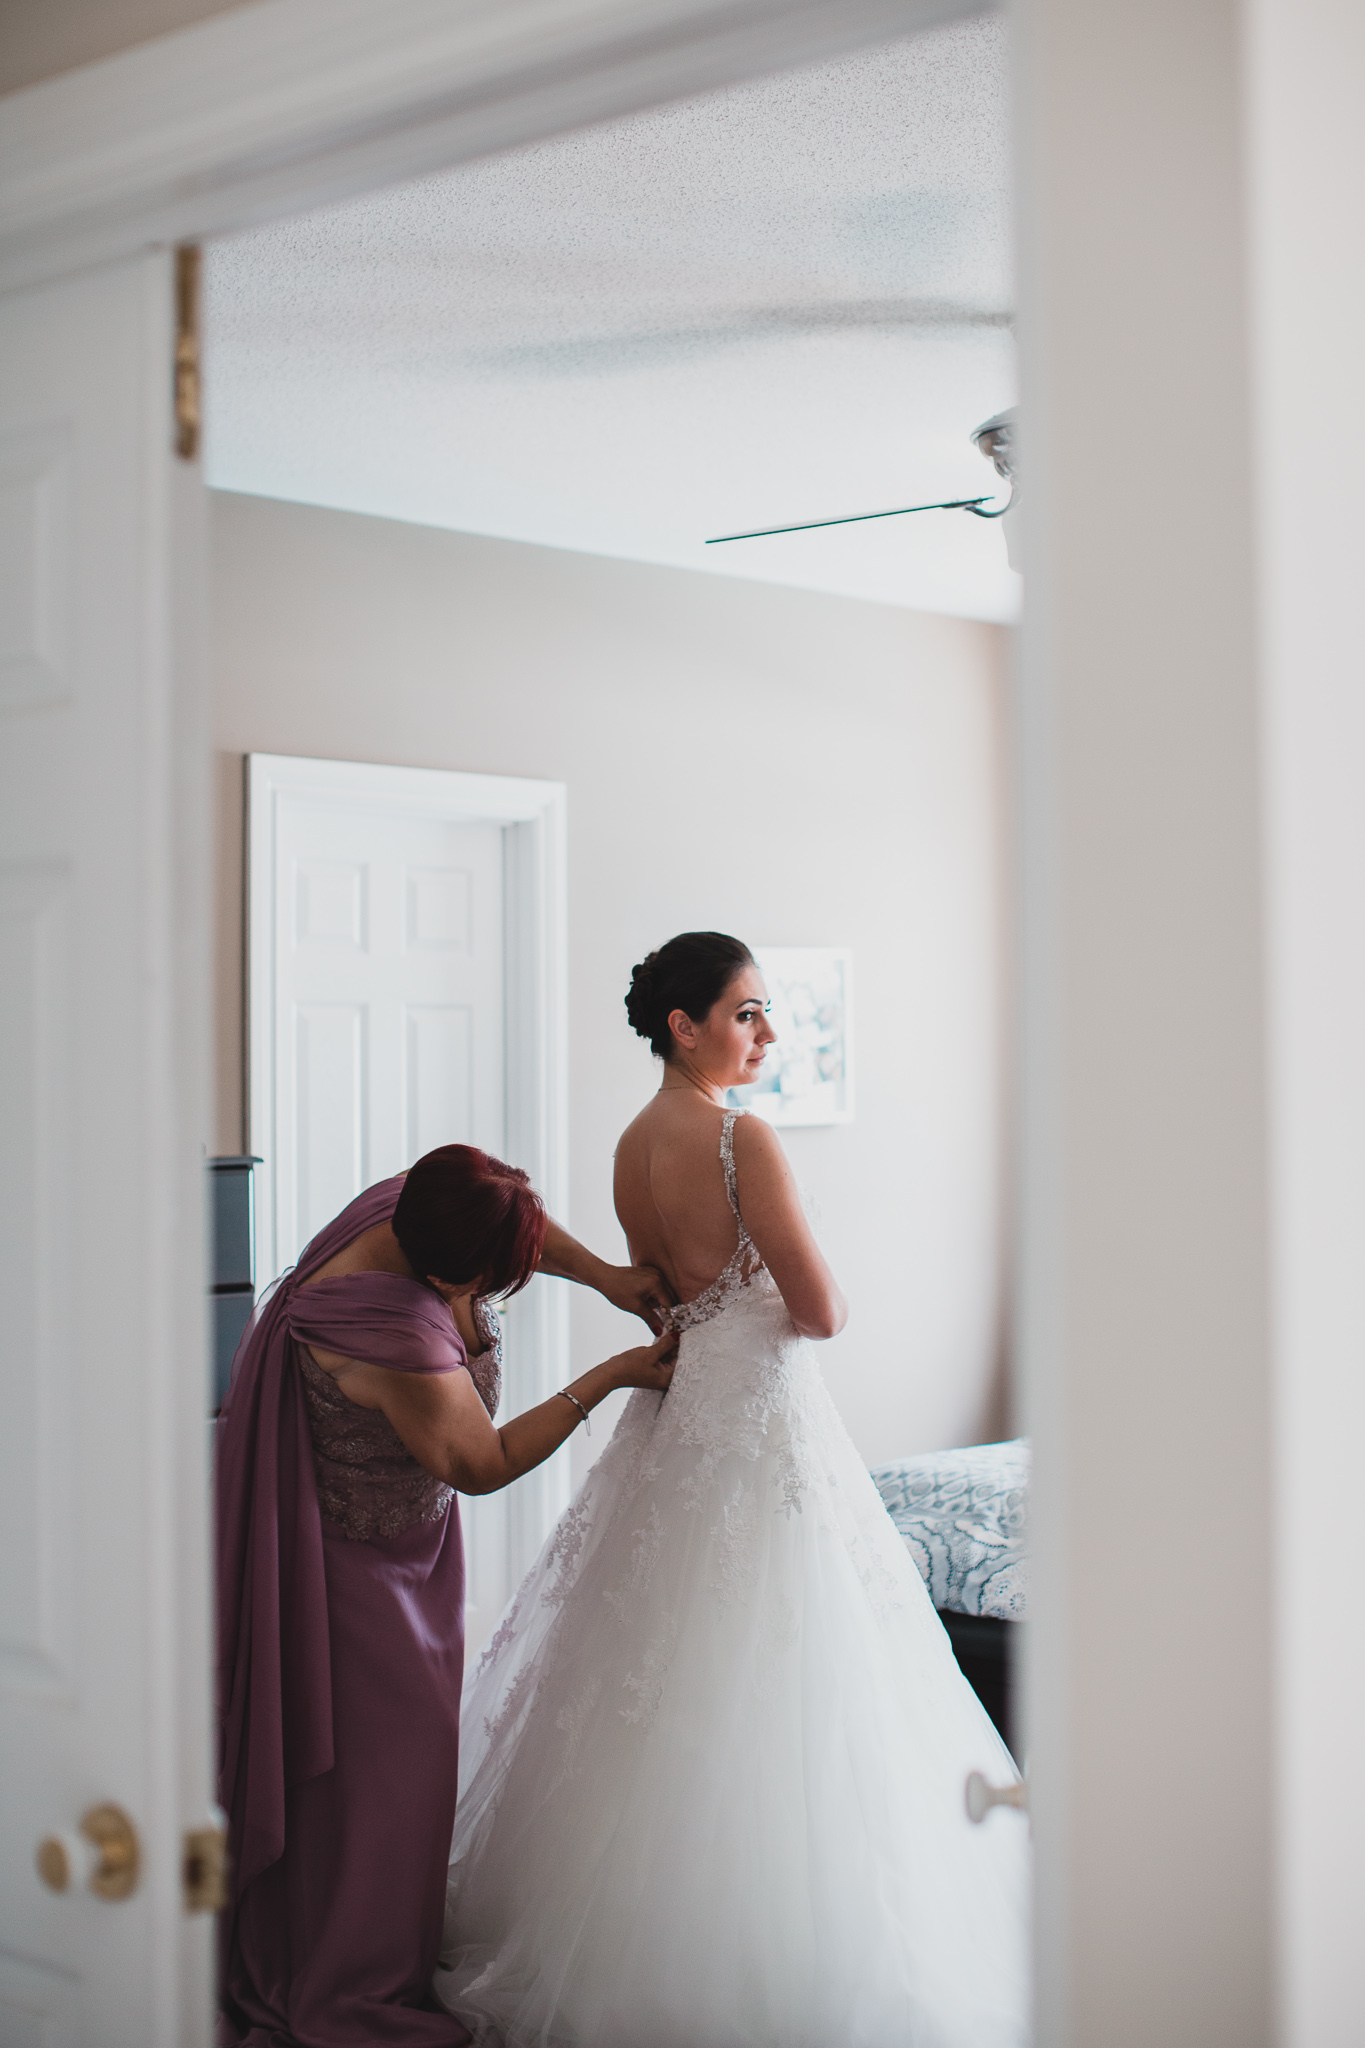 Intimate wedding moments captured